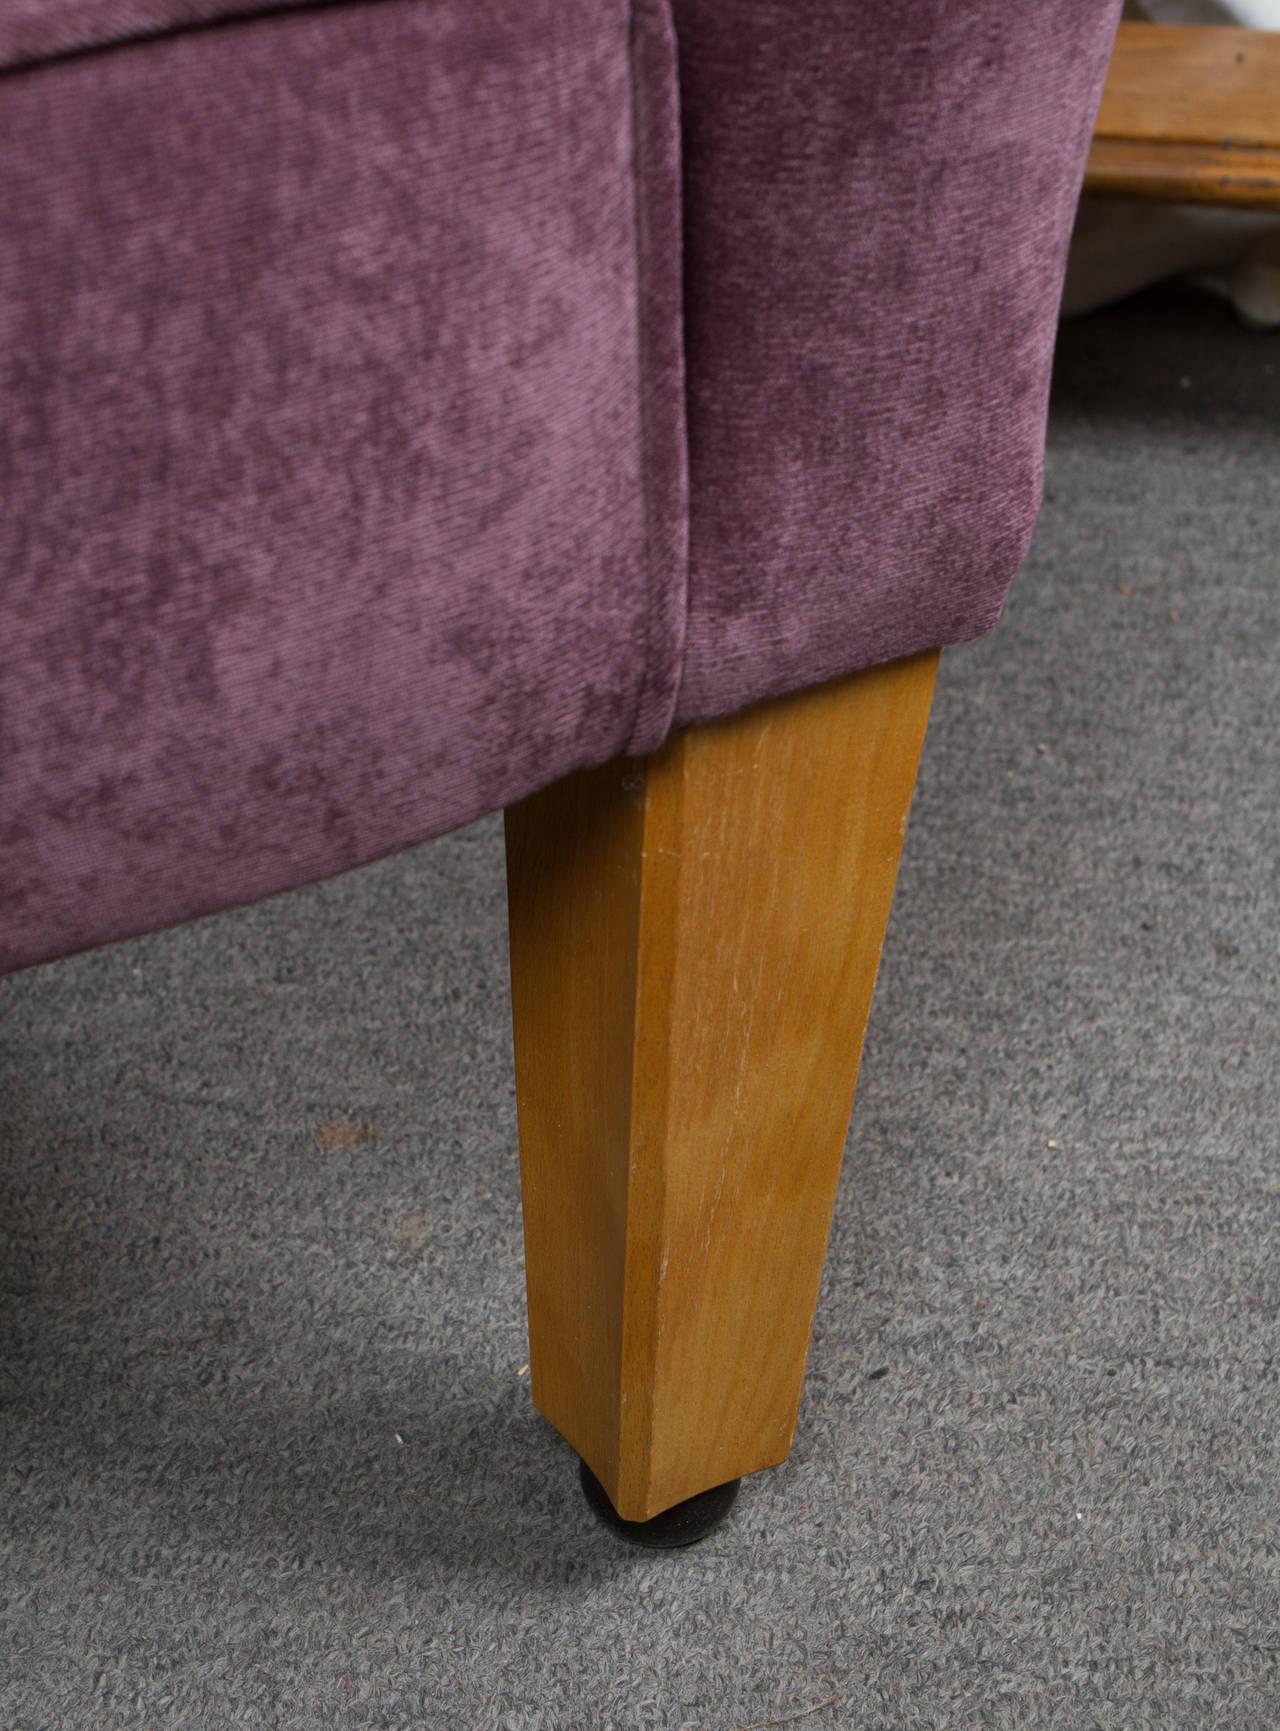 Pair of Josef Hoffmann Wiener Werkstatte Style Armchairs by Wittmann, Austria For Sale 1